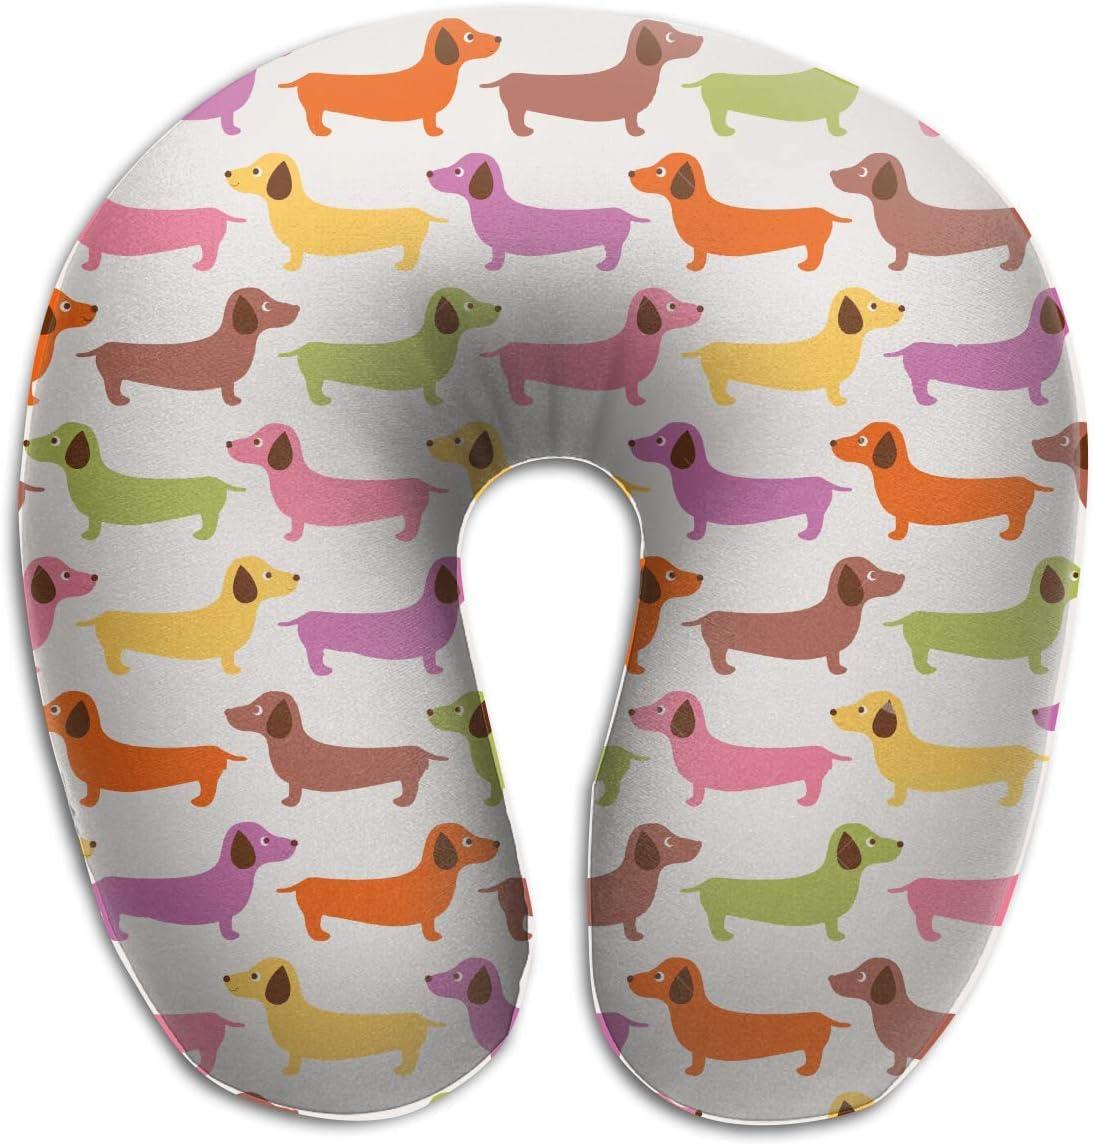 Dachshund Dog Memory Foam Travel Pillow